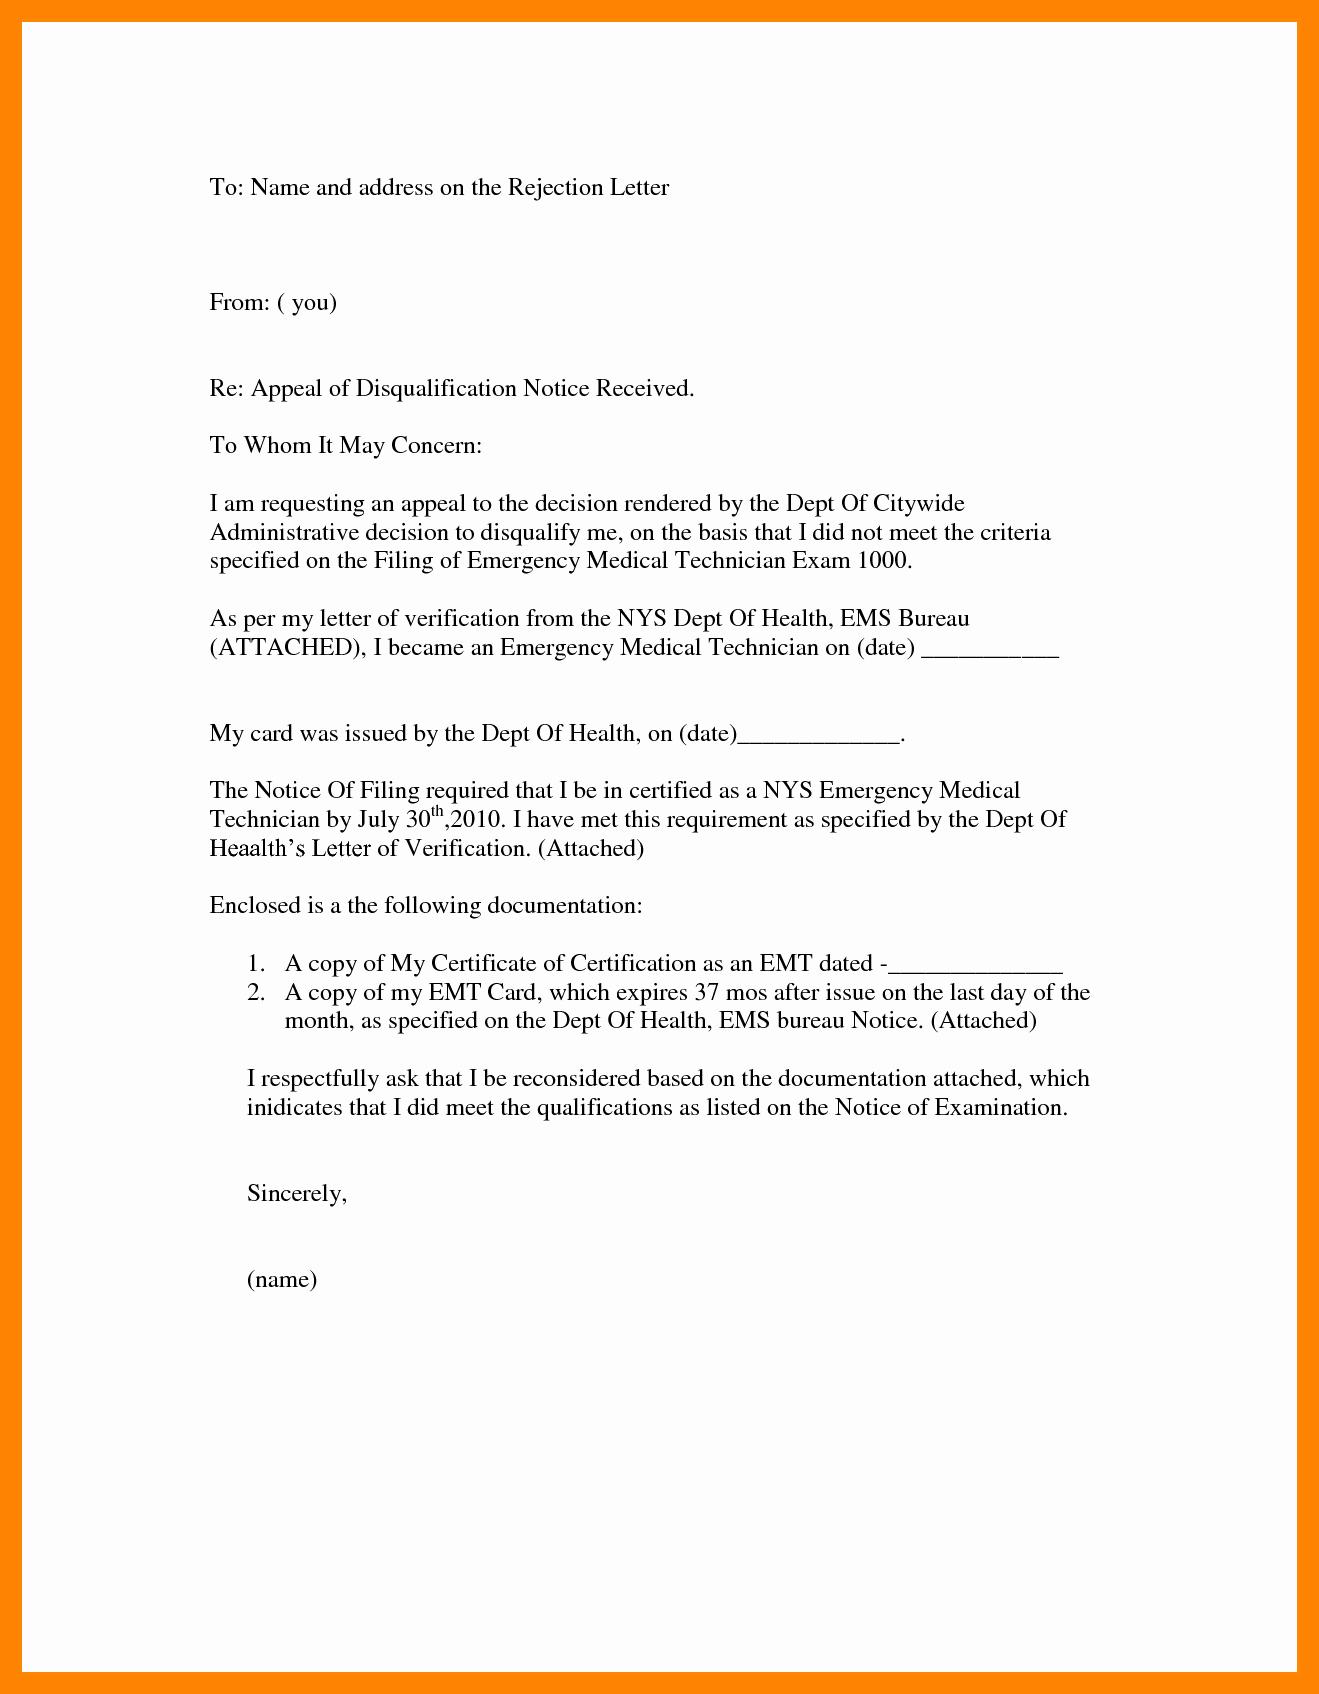 Unemployment Statement Letter New 12 Unemployment Appeal Sample Letter